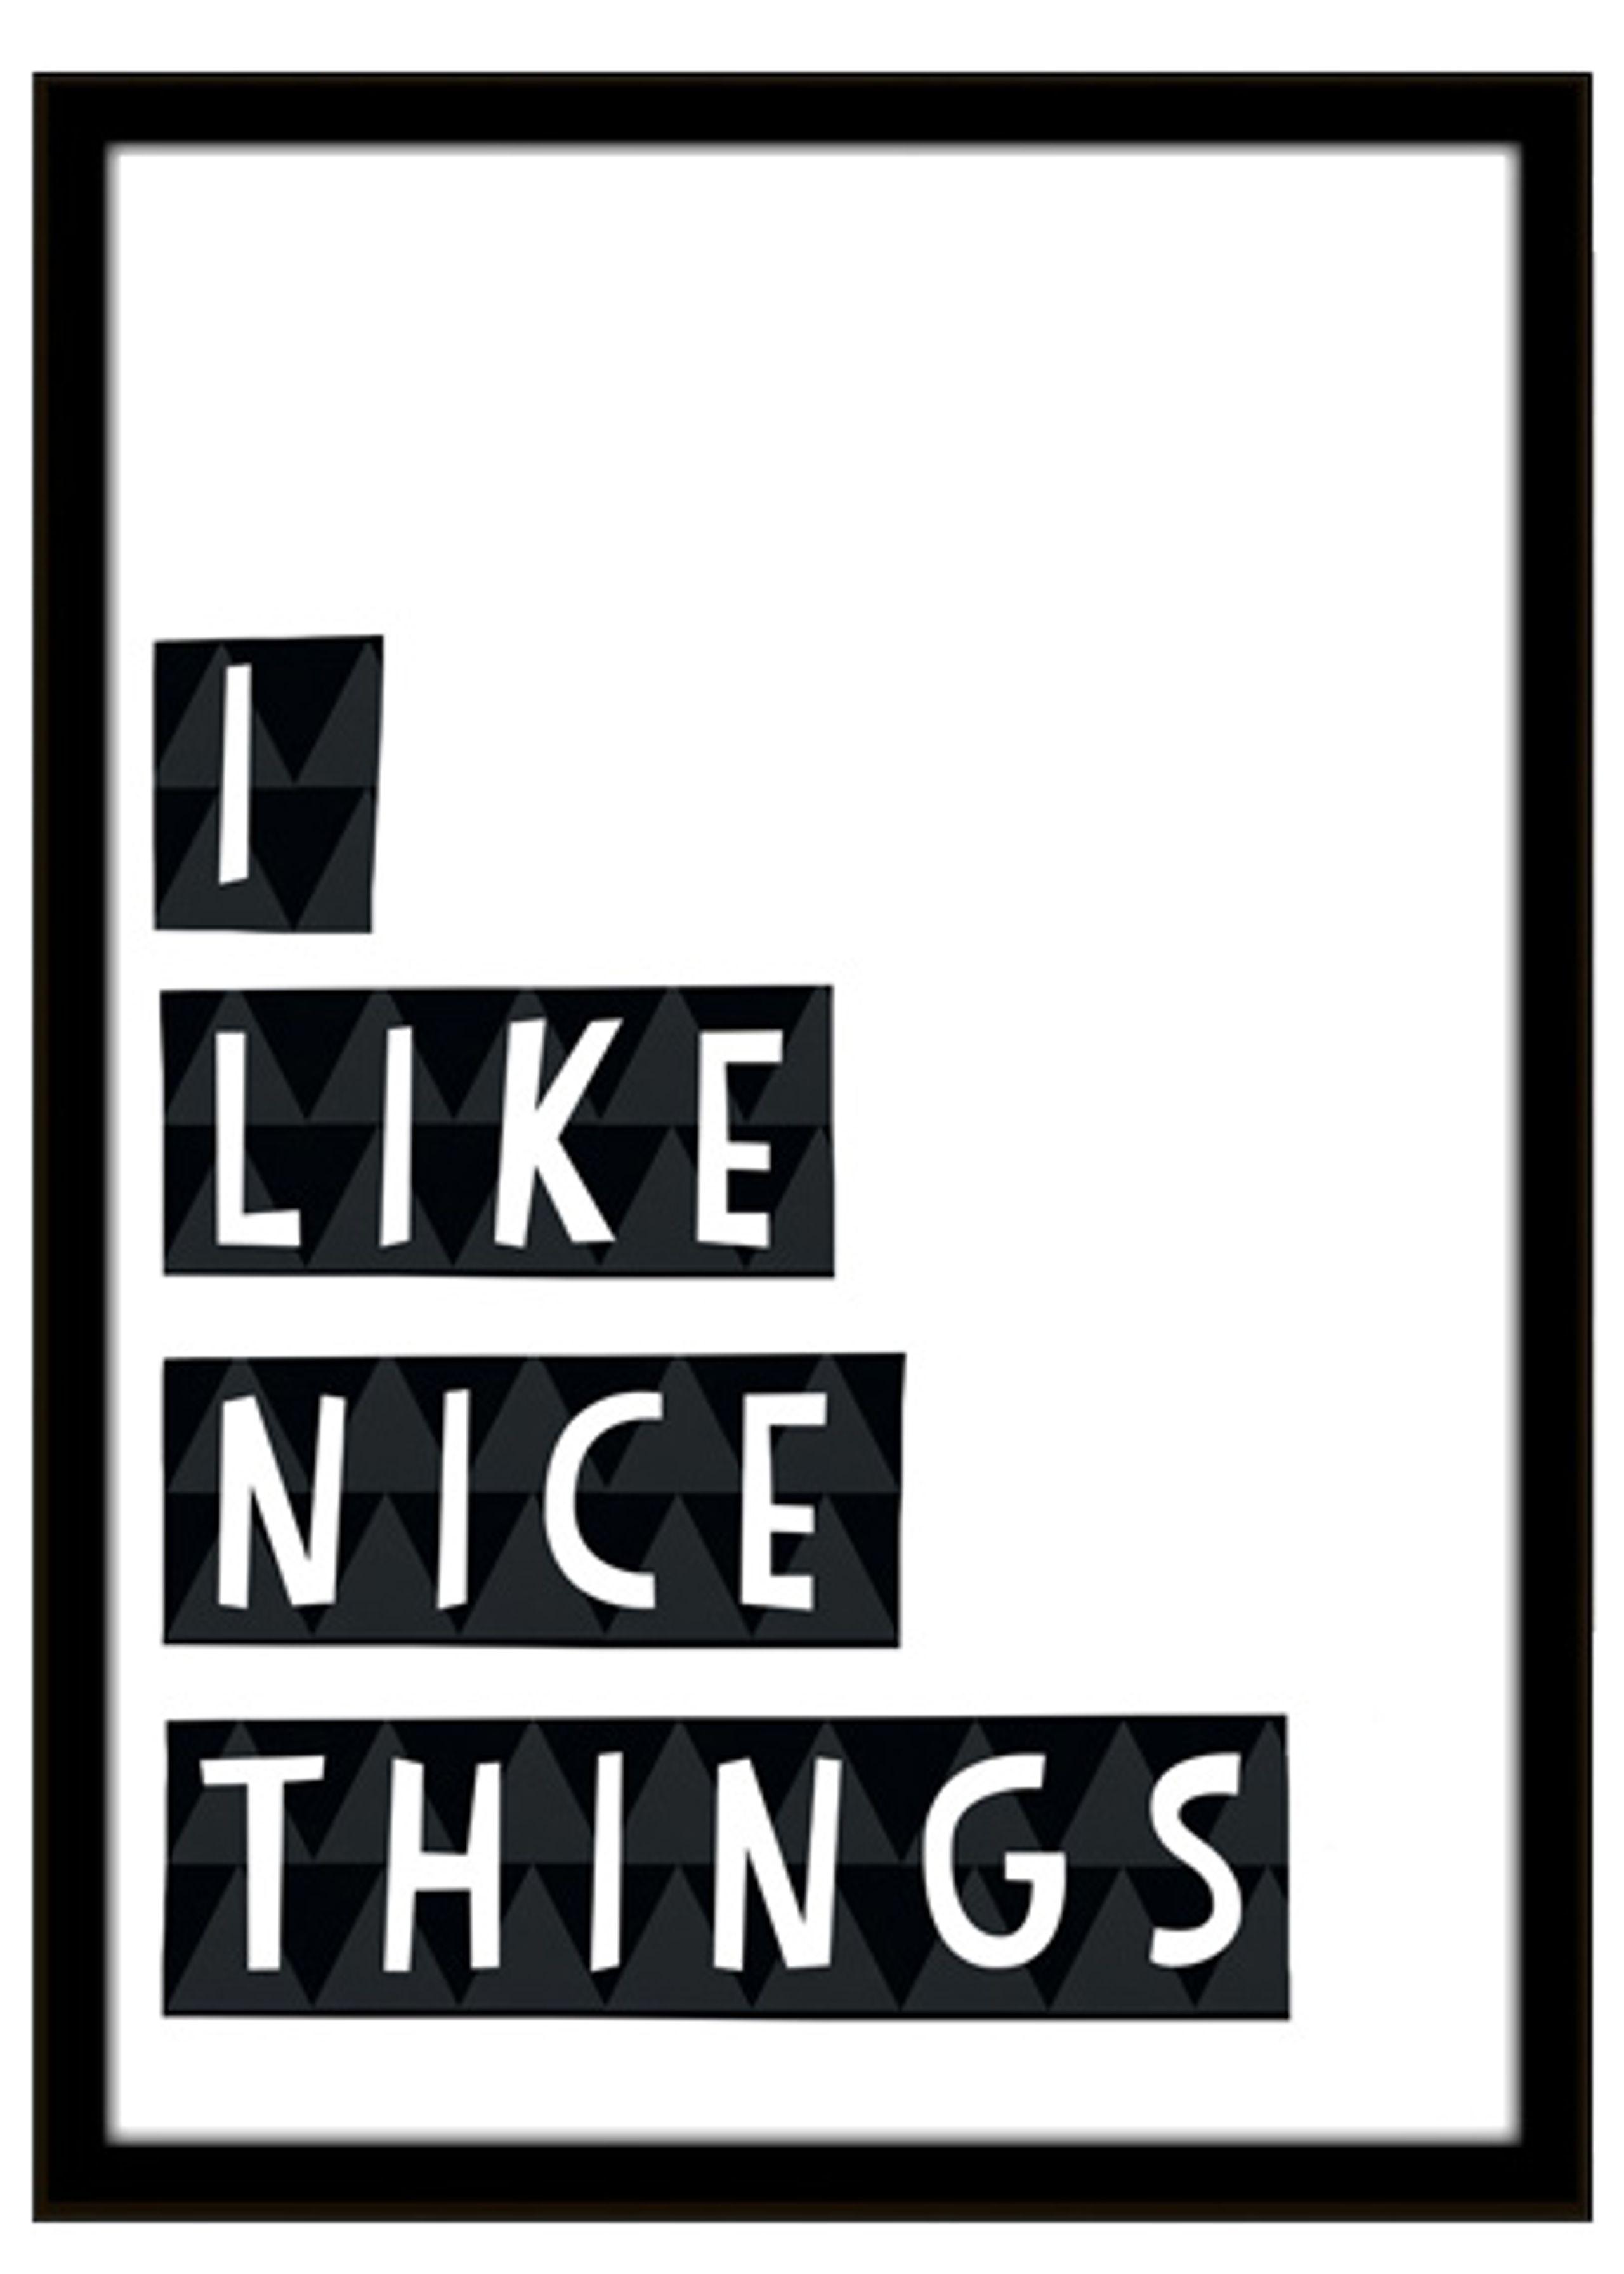 Nice things 30x40